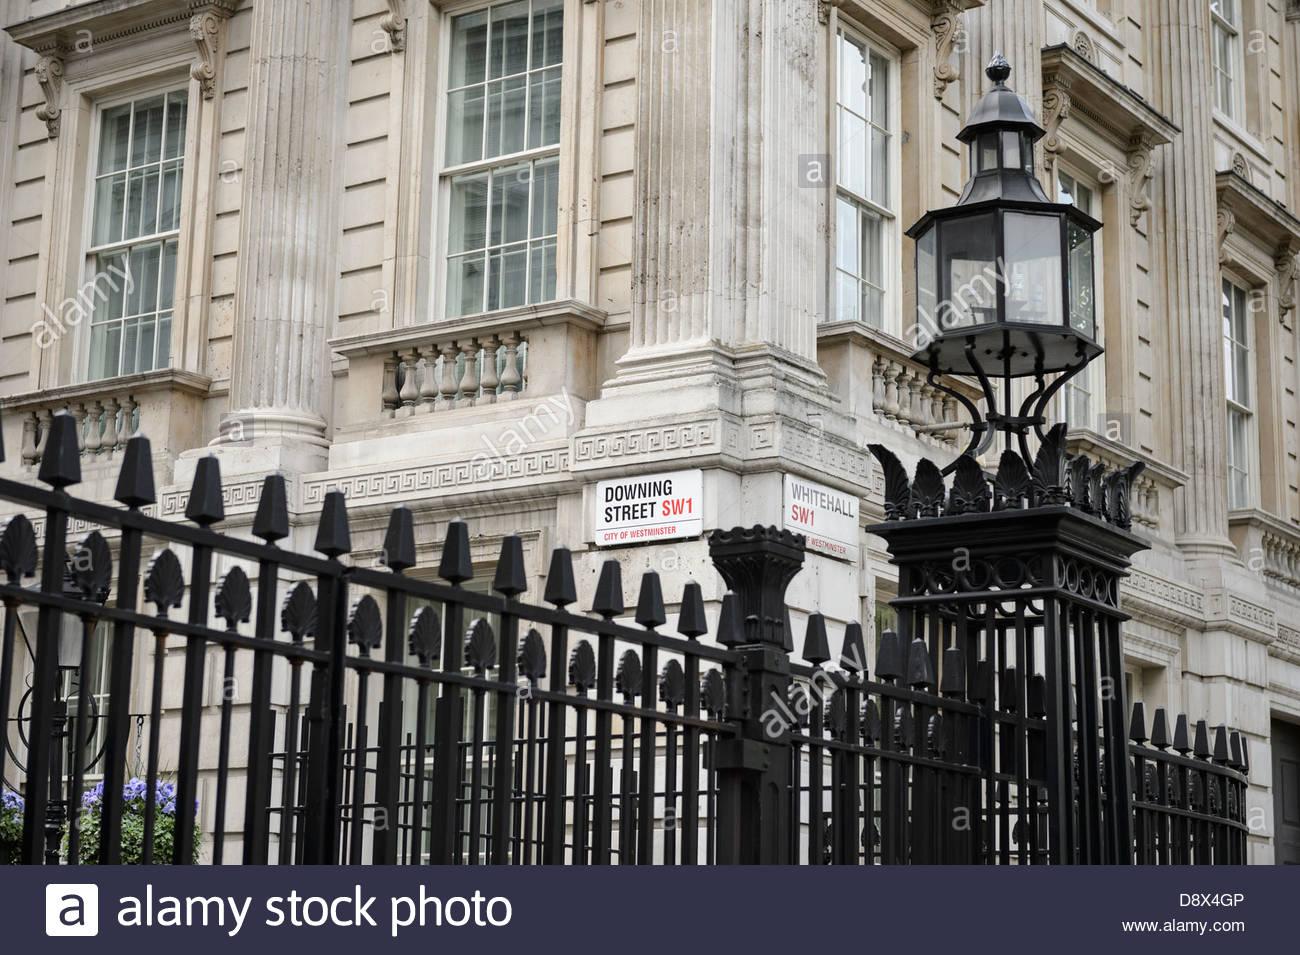 Street Sign, Downing Street, Westminster, London, England, United Kingdom 2013. - Stock Image